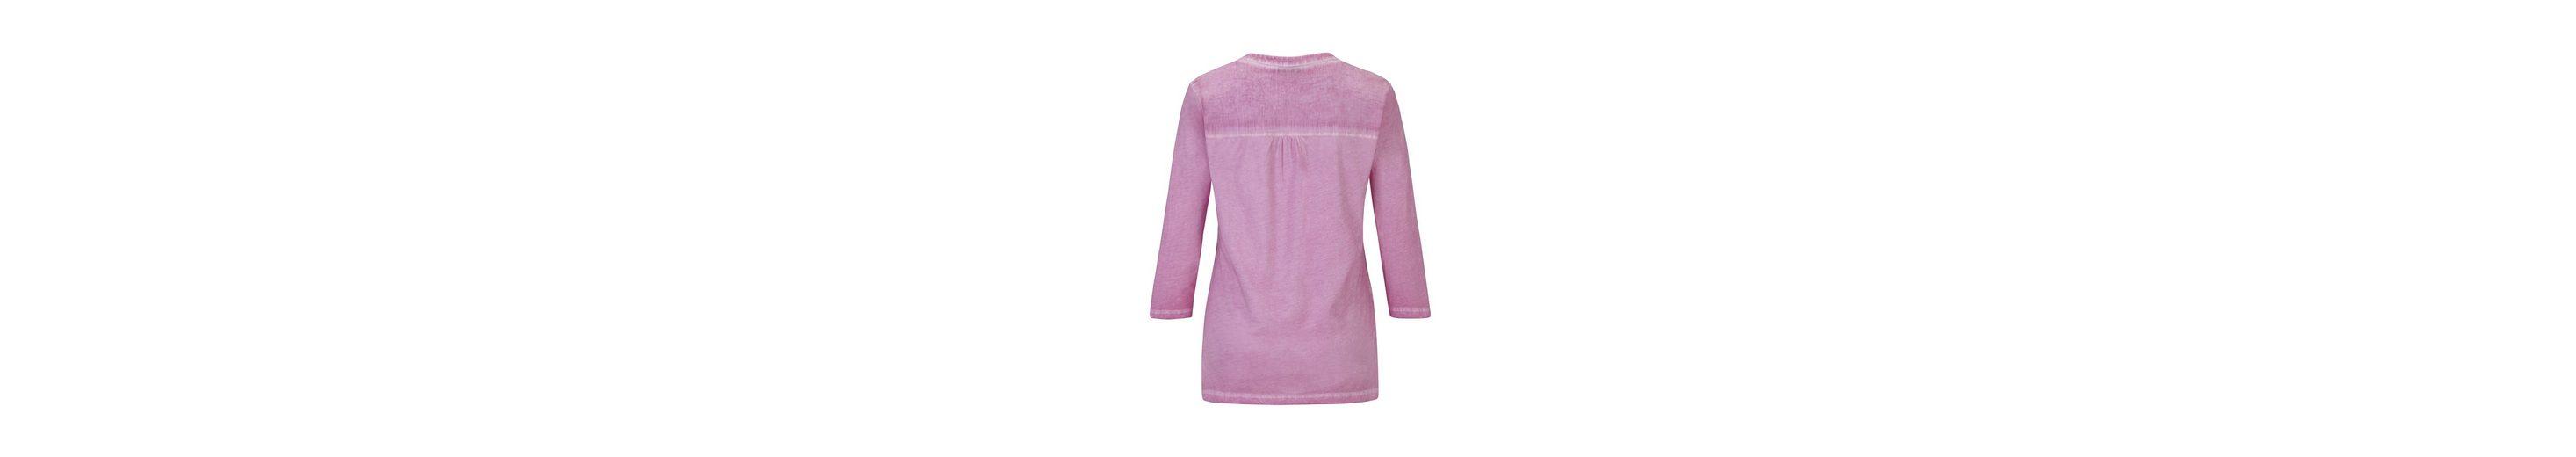 Hajo Stückgefärbtes Blusenshirt